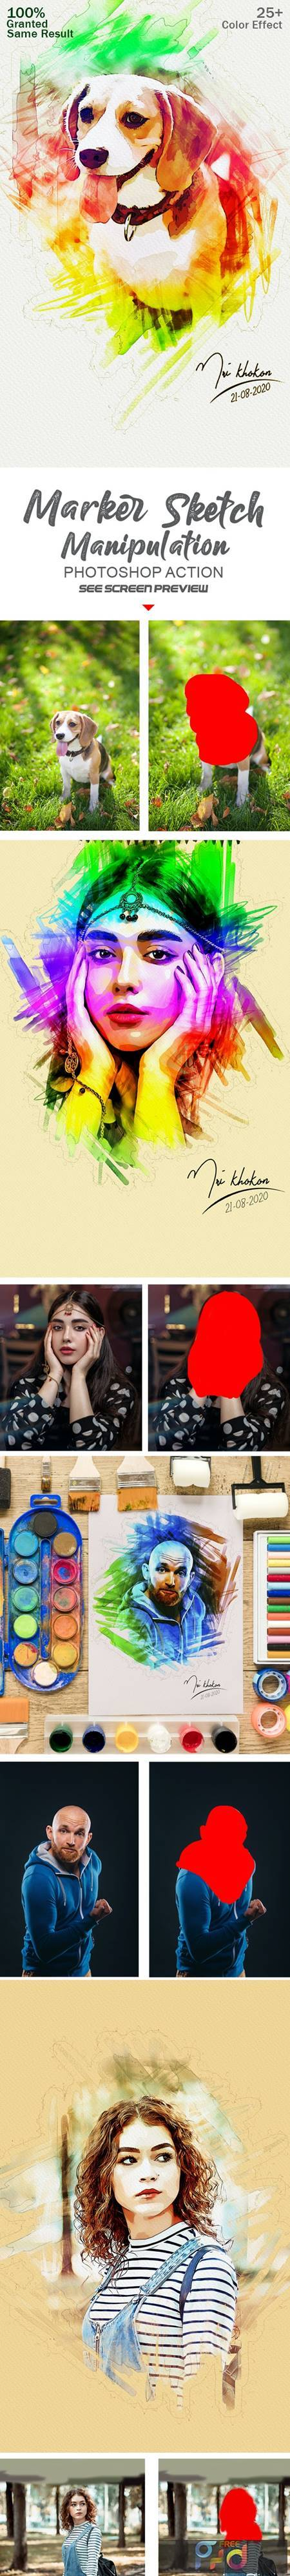 Marker Sketch Photoshop Action 28287245 1